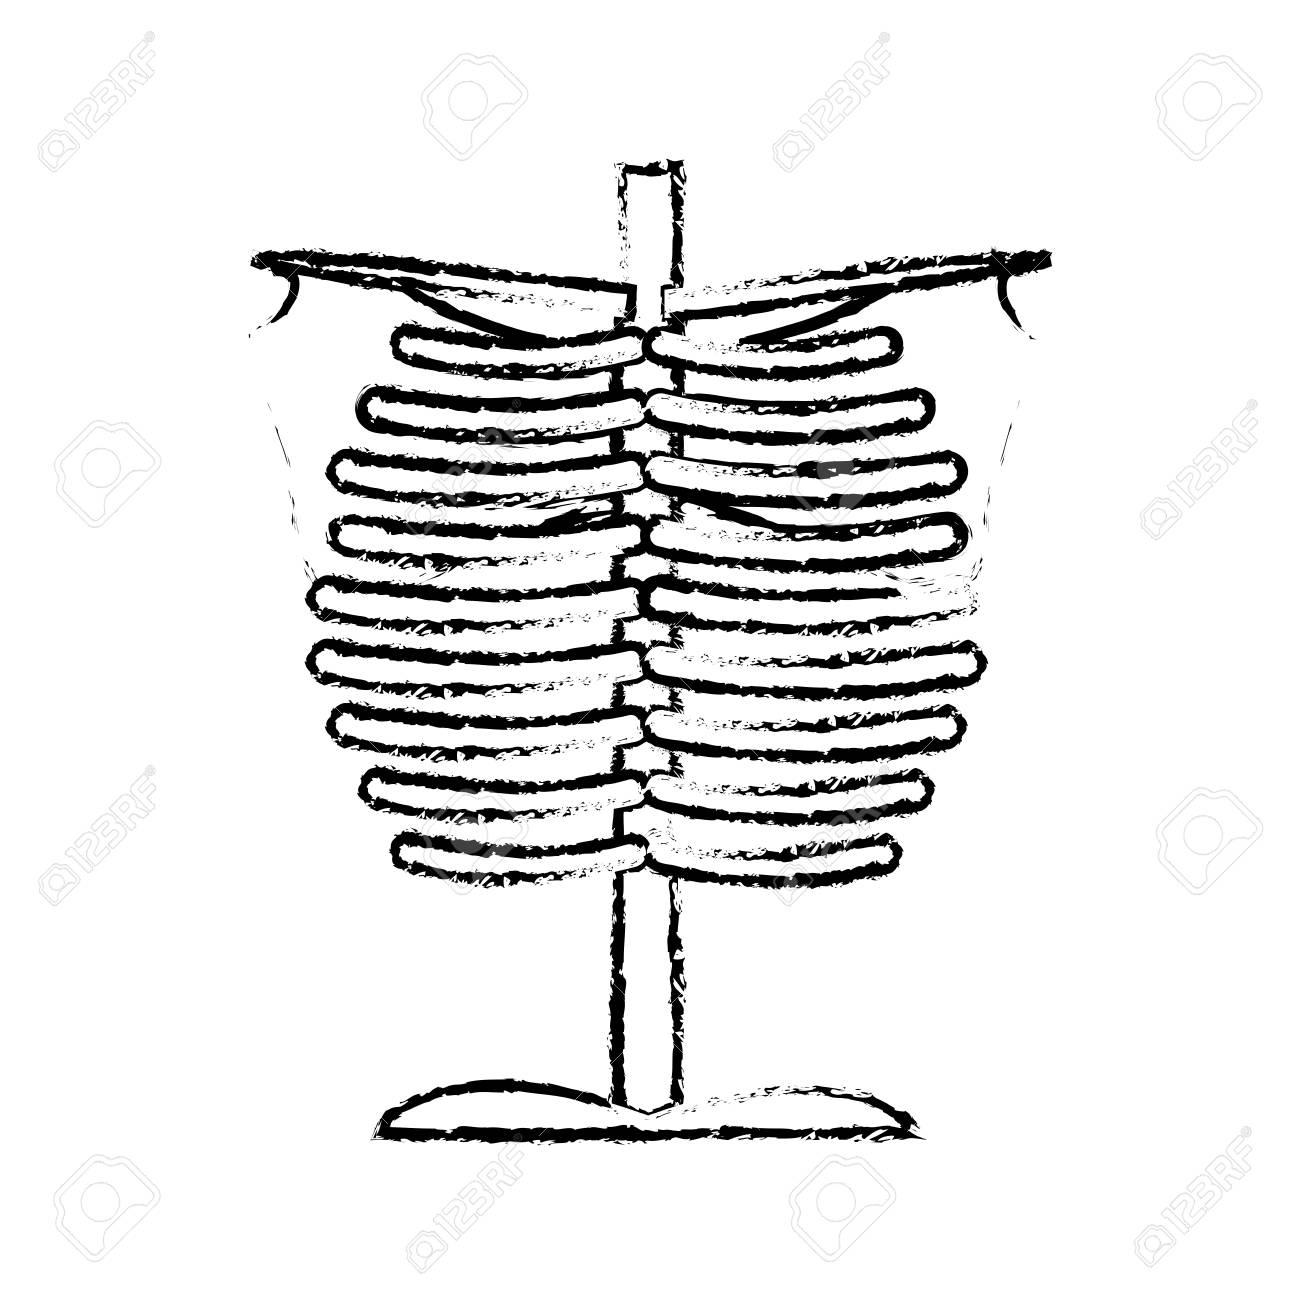 1300x1300 Sketch Human Chest Bones Anatomical Medical Vector Illustration